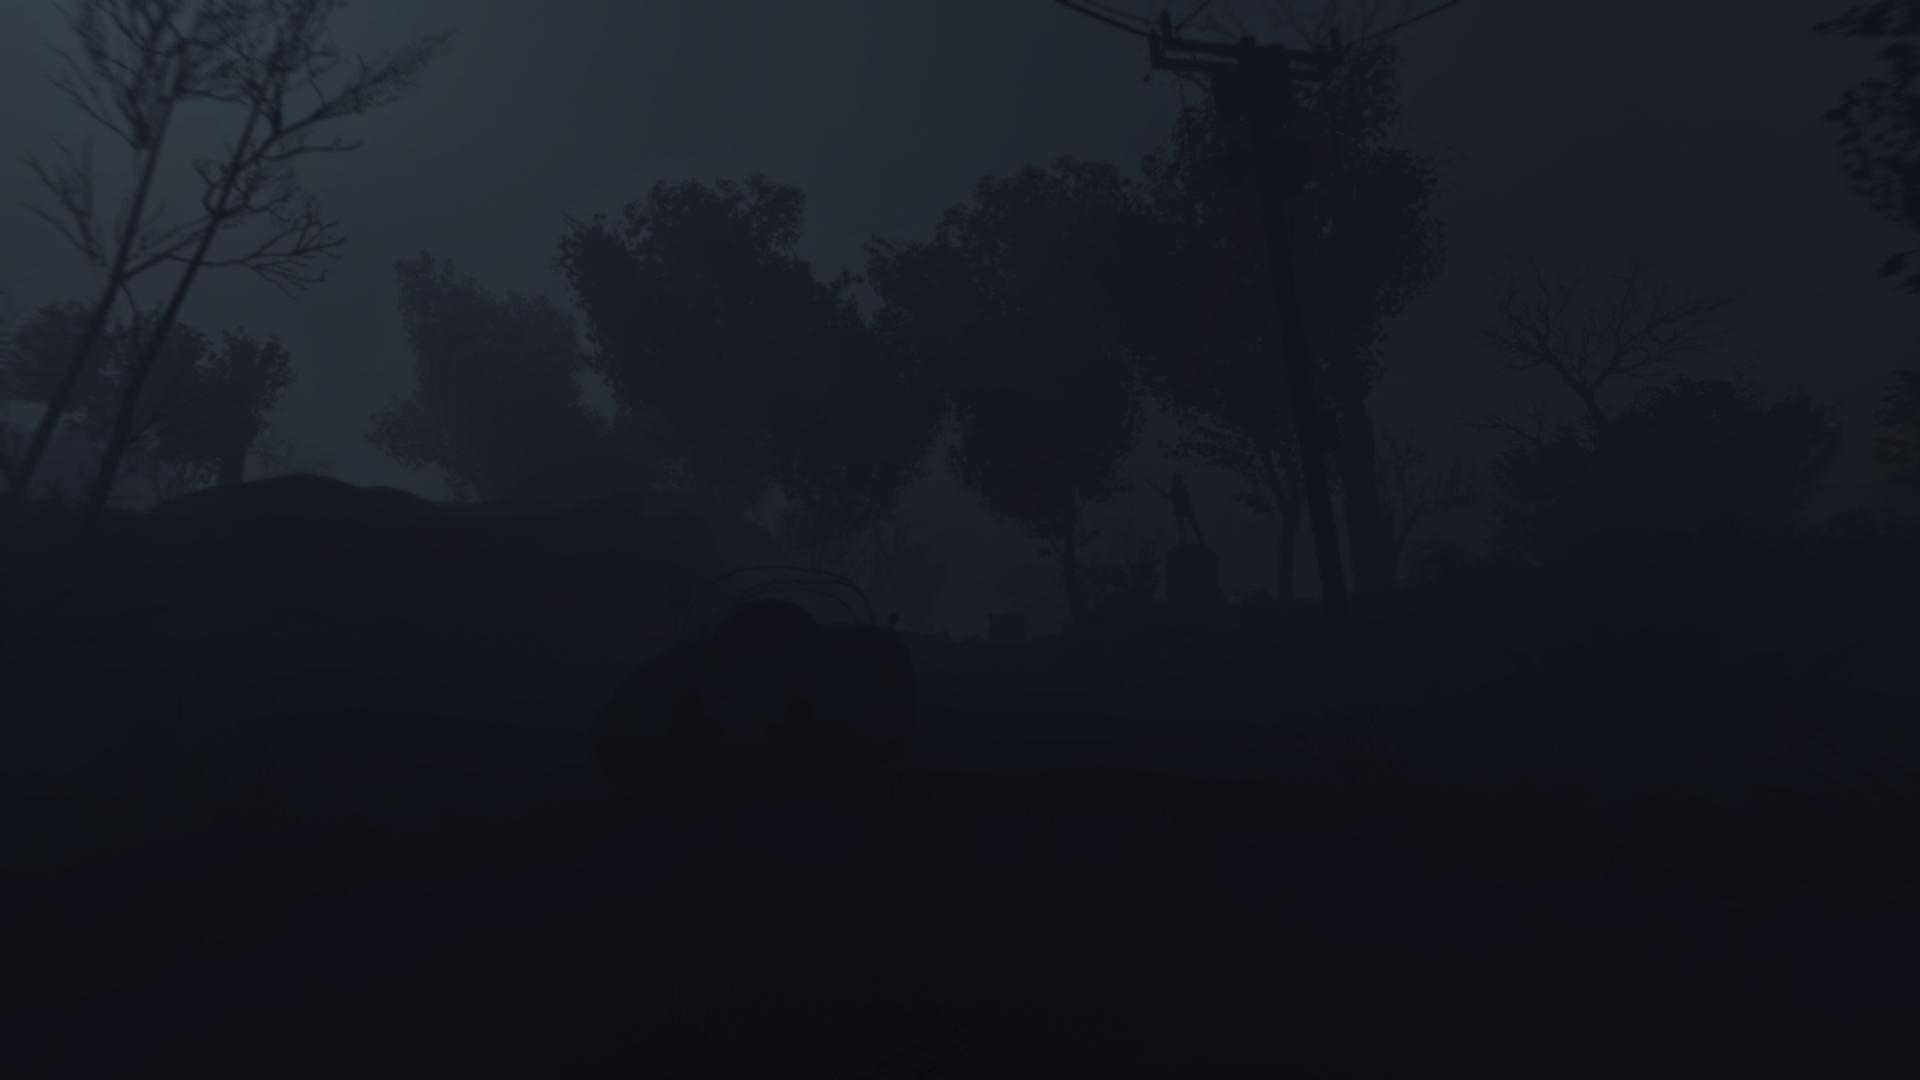 Fallout4 2020-08-31 23-11-13.jpg